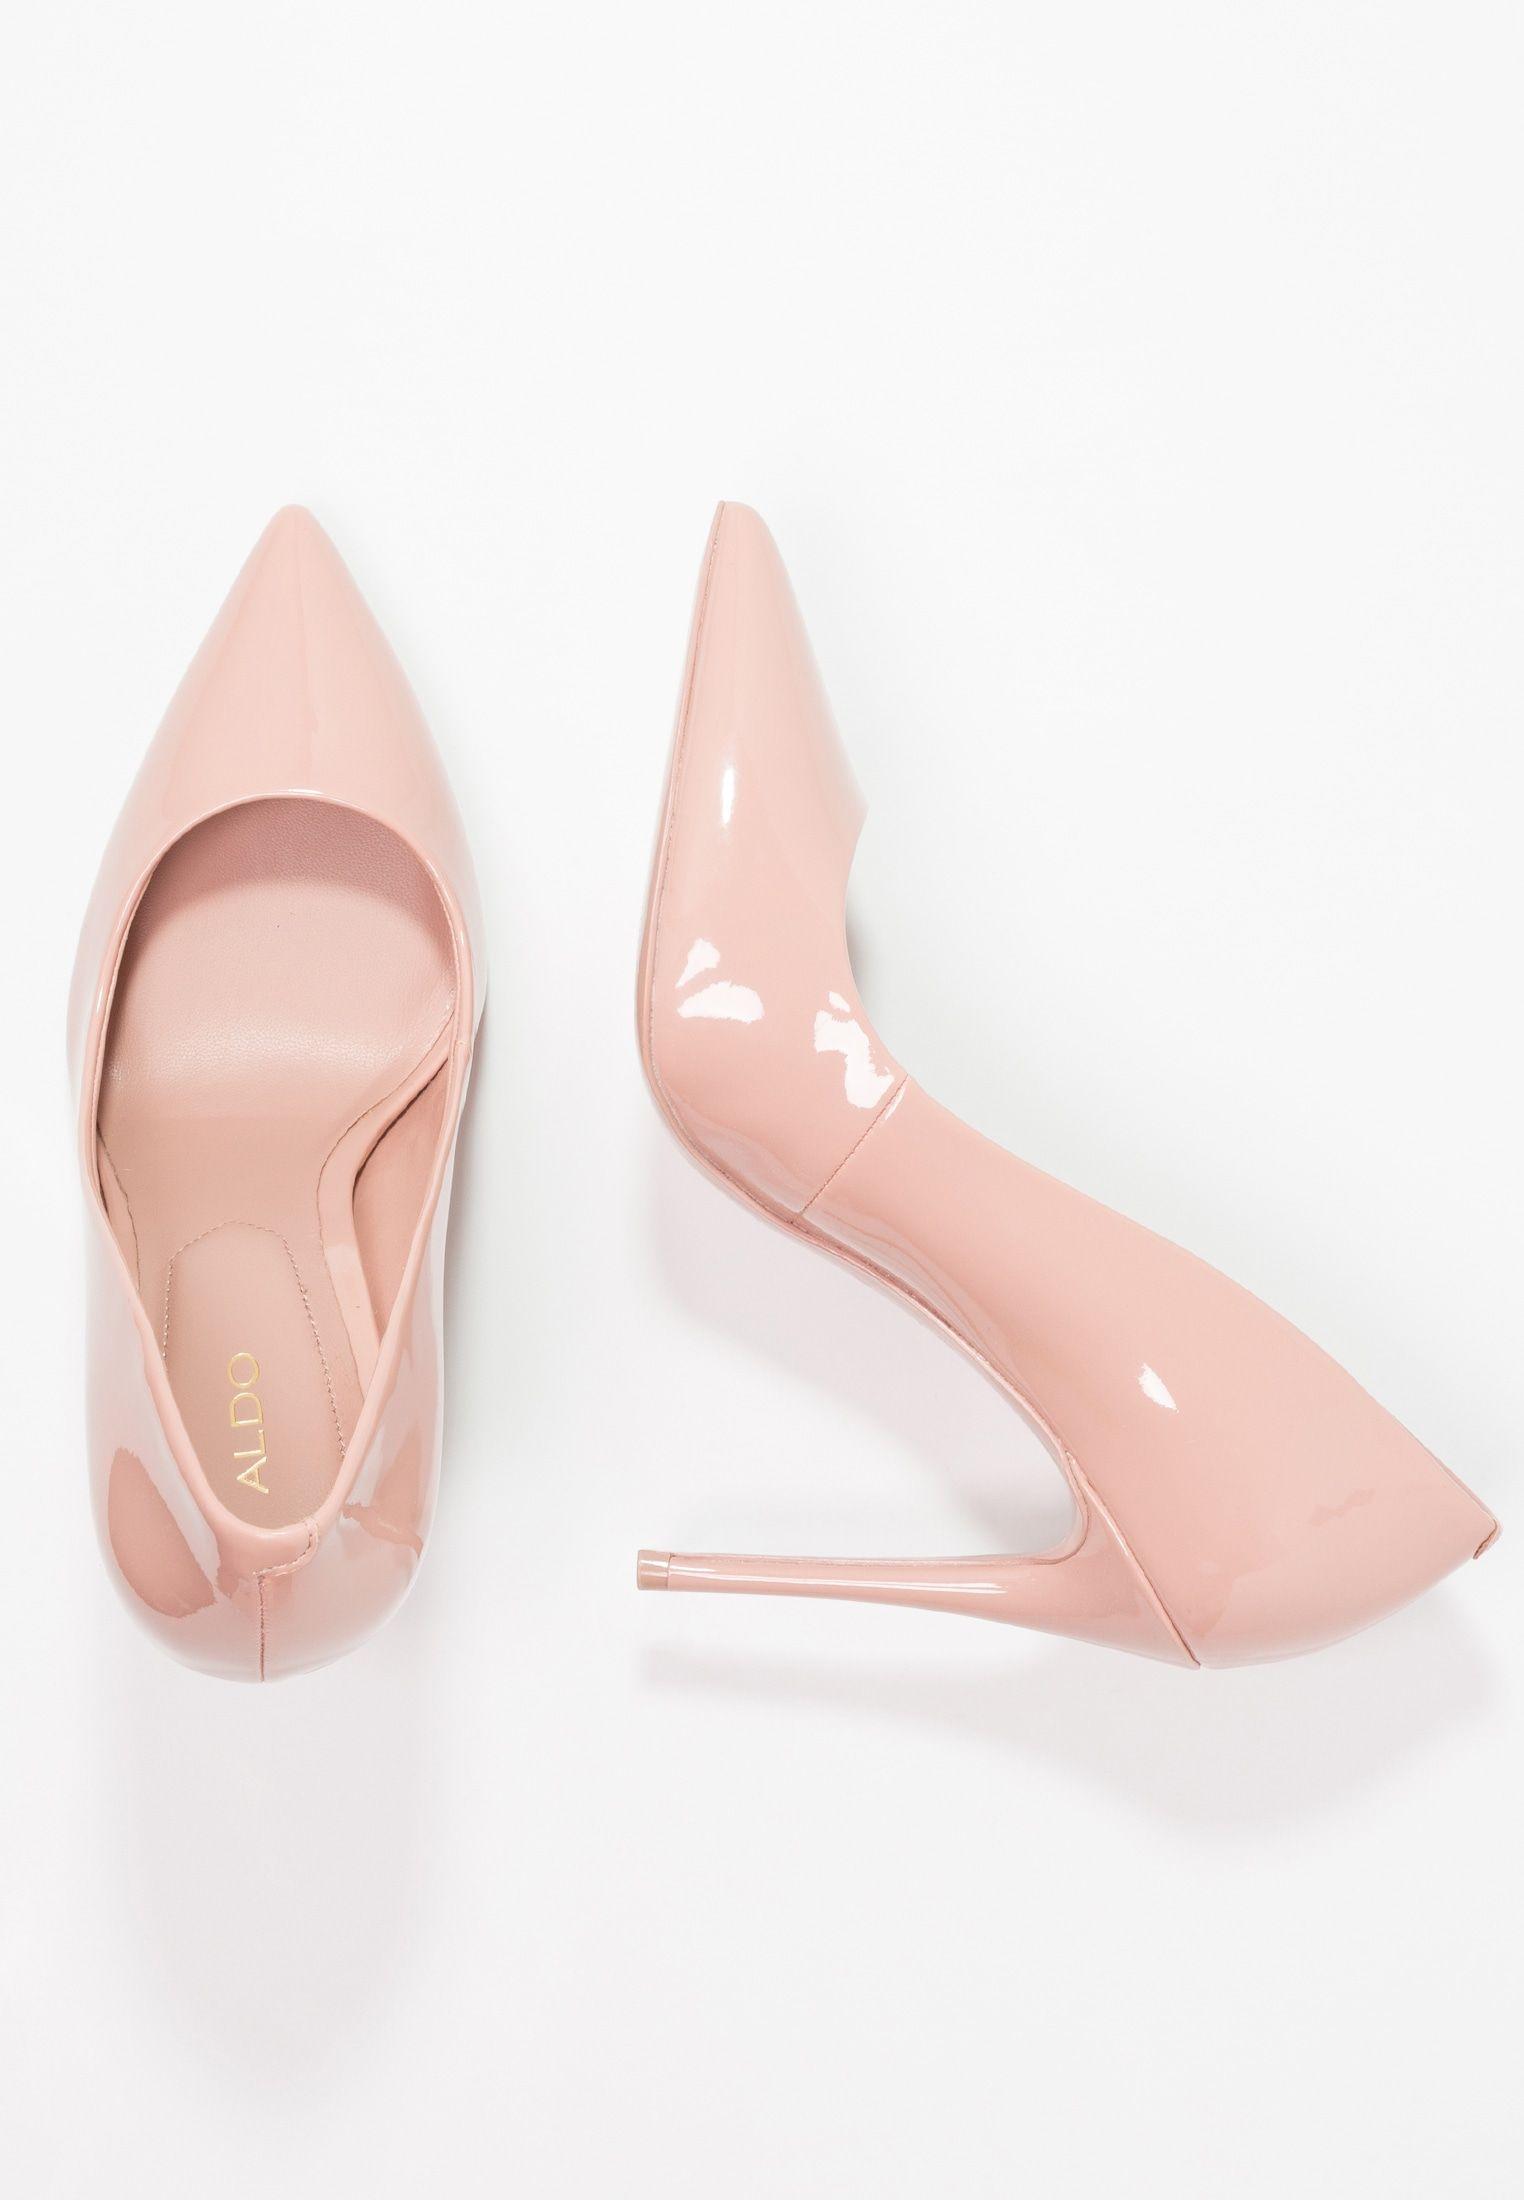 31693a1505437f STESSY - High Heel Pumps - light pink   Zalando.de 🛒 in 2019